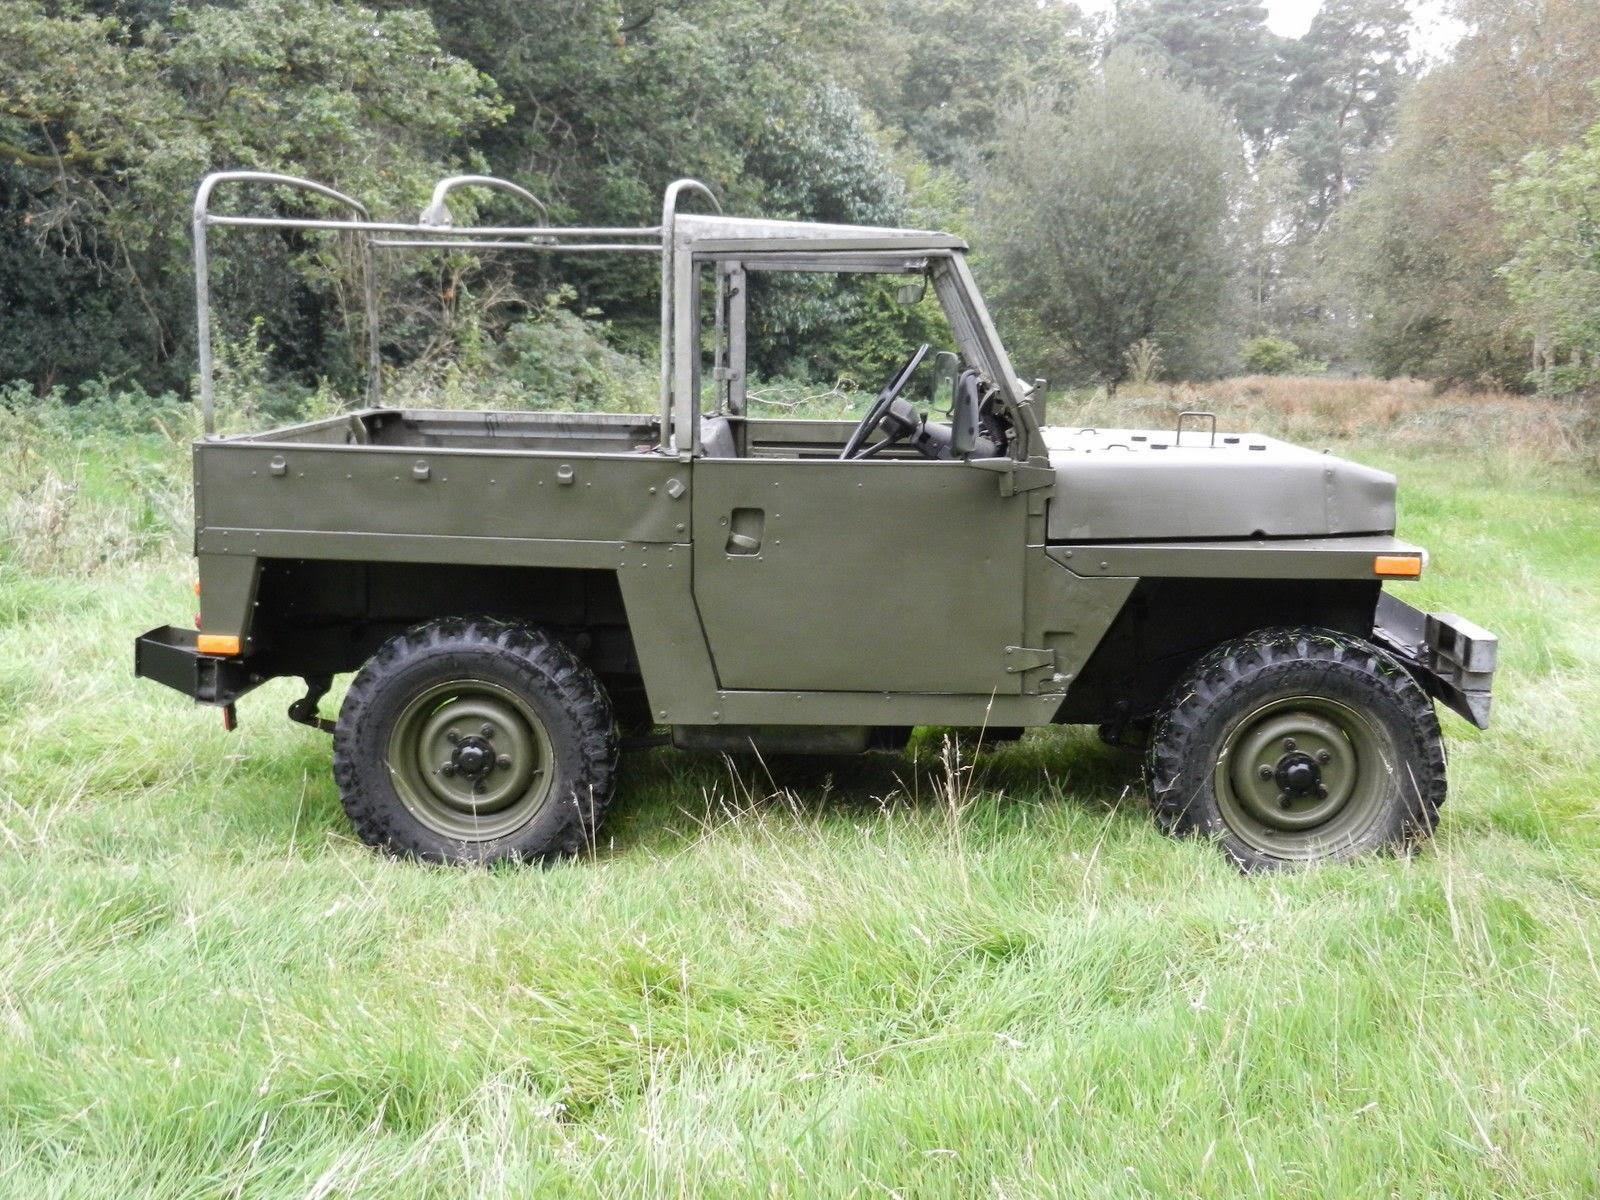 Land Rover Uk Military Jeep on Custom Jeep Kaiser M715